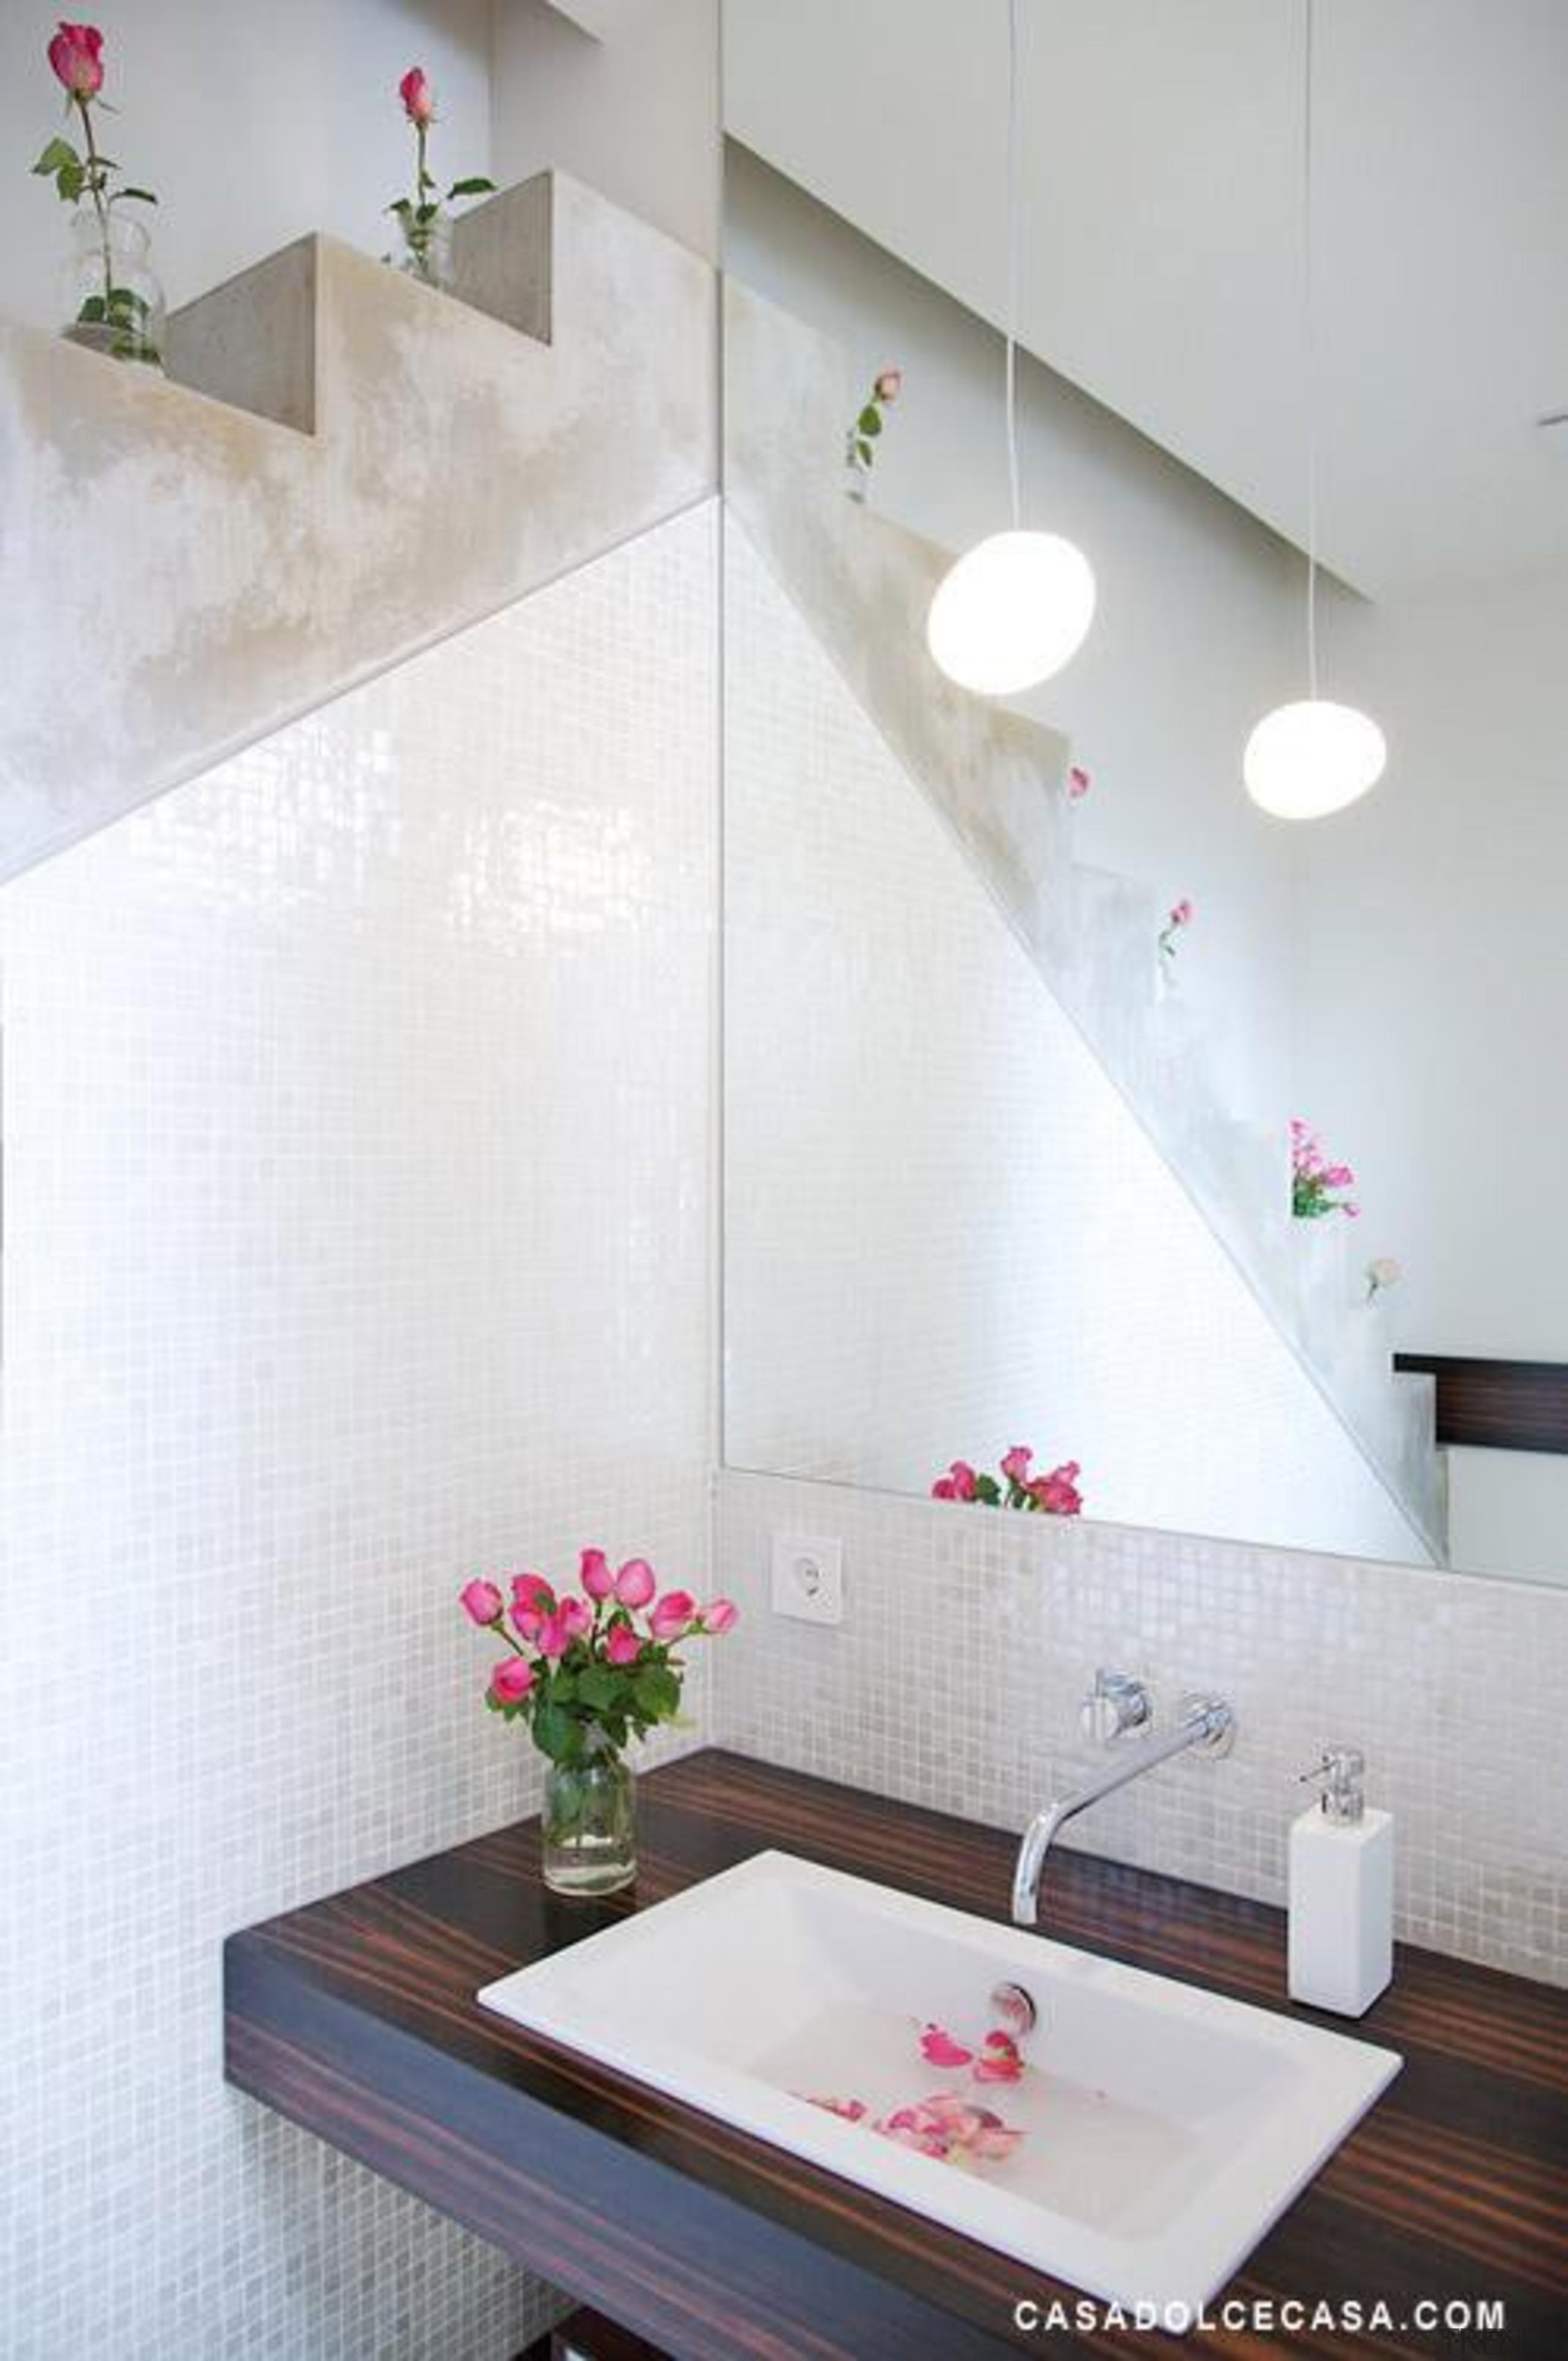 vetro bianco bathroom splashback wall - Vetro Mosaics bathroom, ceiling, ceramic, floor, flooring, interior design, plumbing fixture, product design, property, room, sink, tap, tile, wall, white